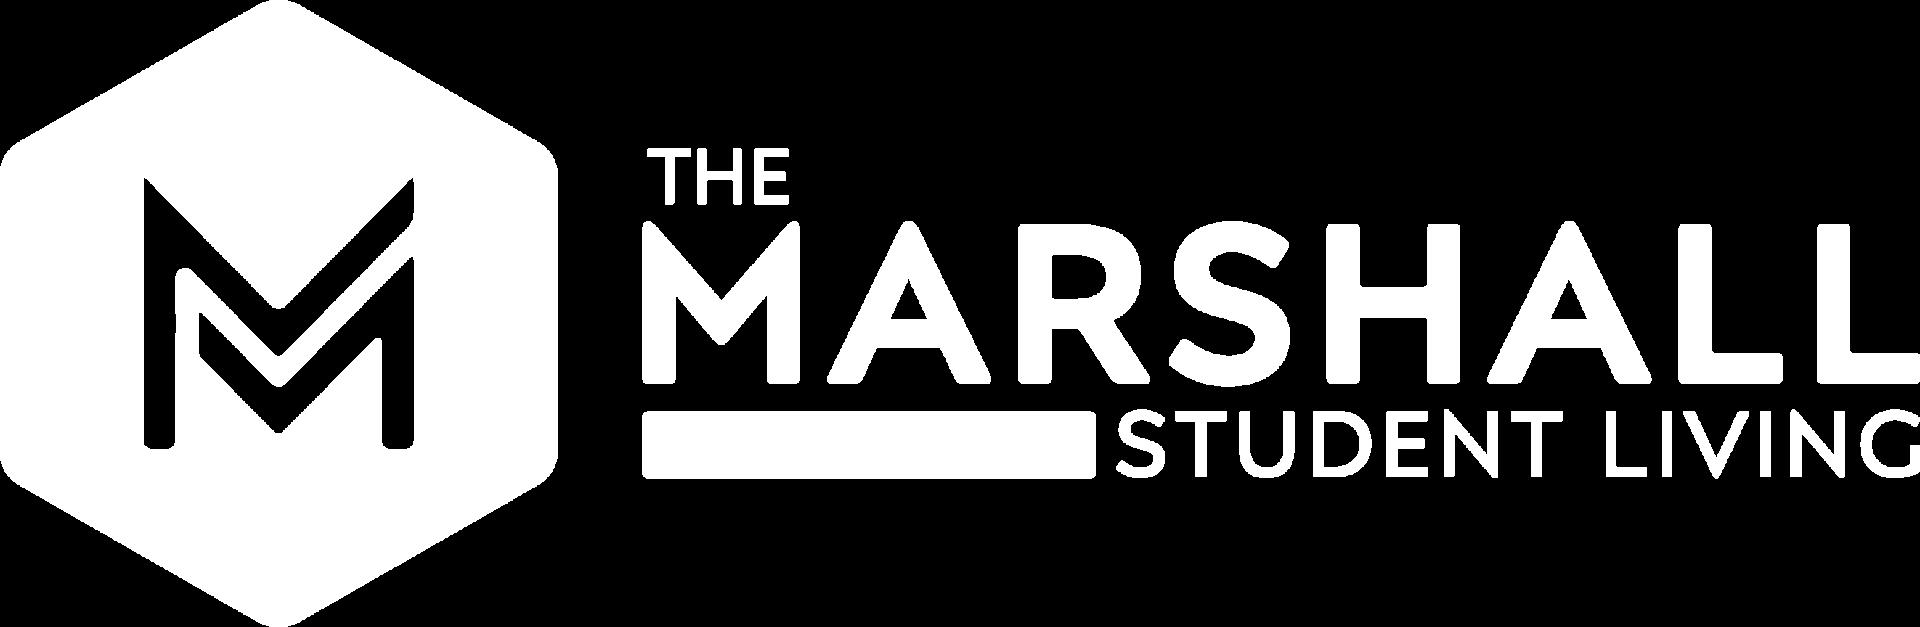 The Marshall Arkansas